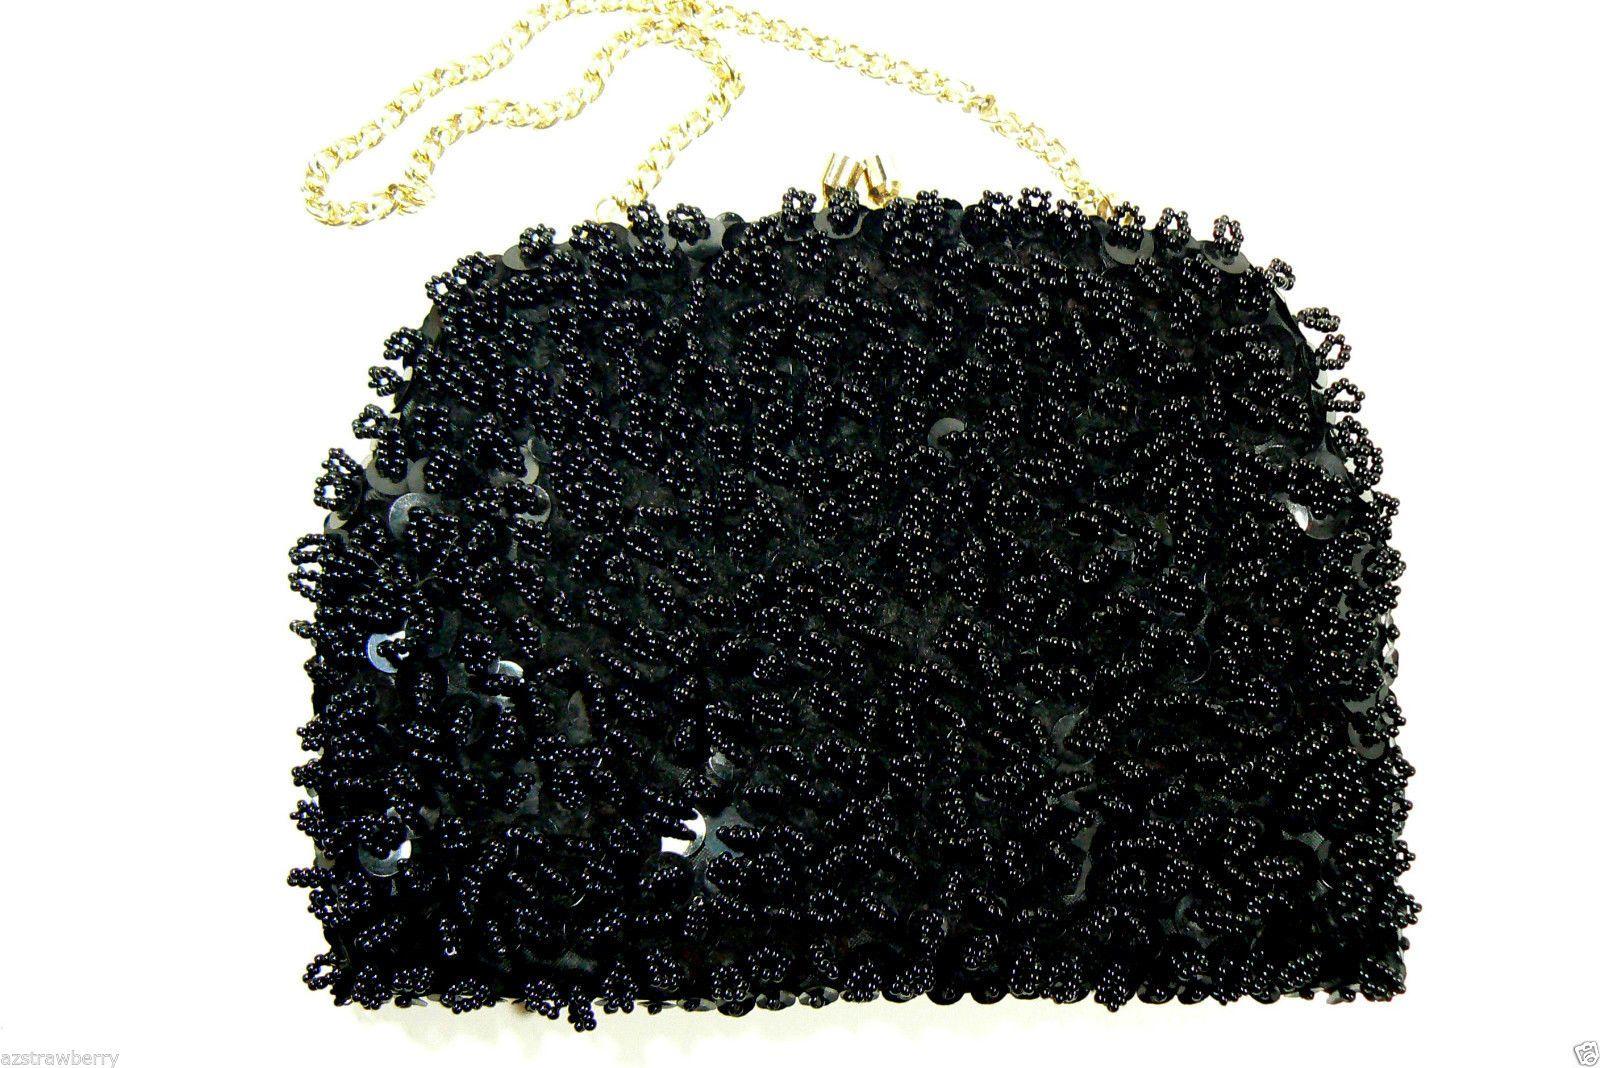 Vintage Hong Kong Black Glass Beads Small Evening Purse Hand Bag Clutch $0 SHIP | eBay